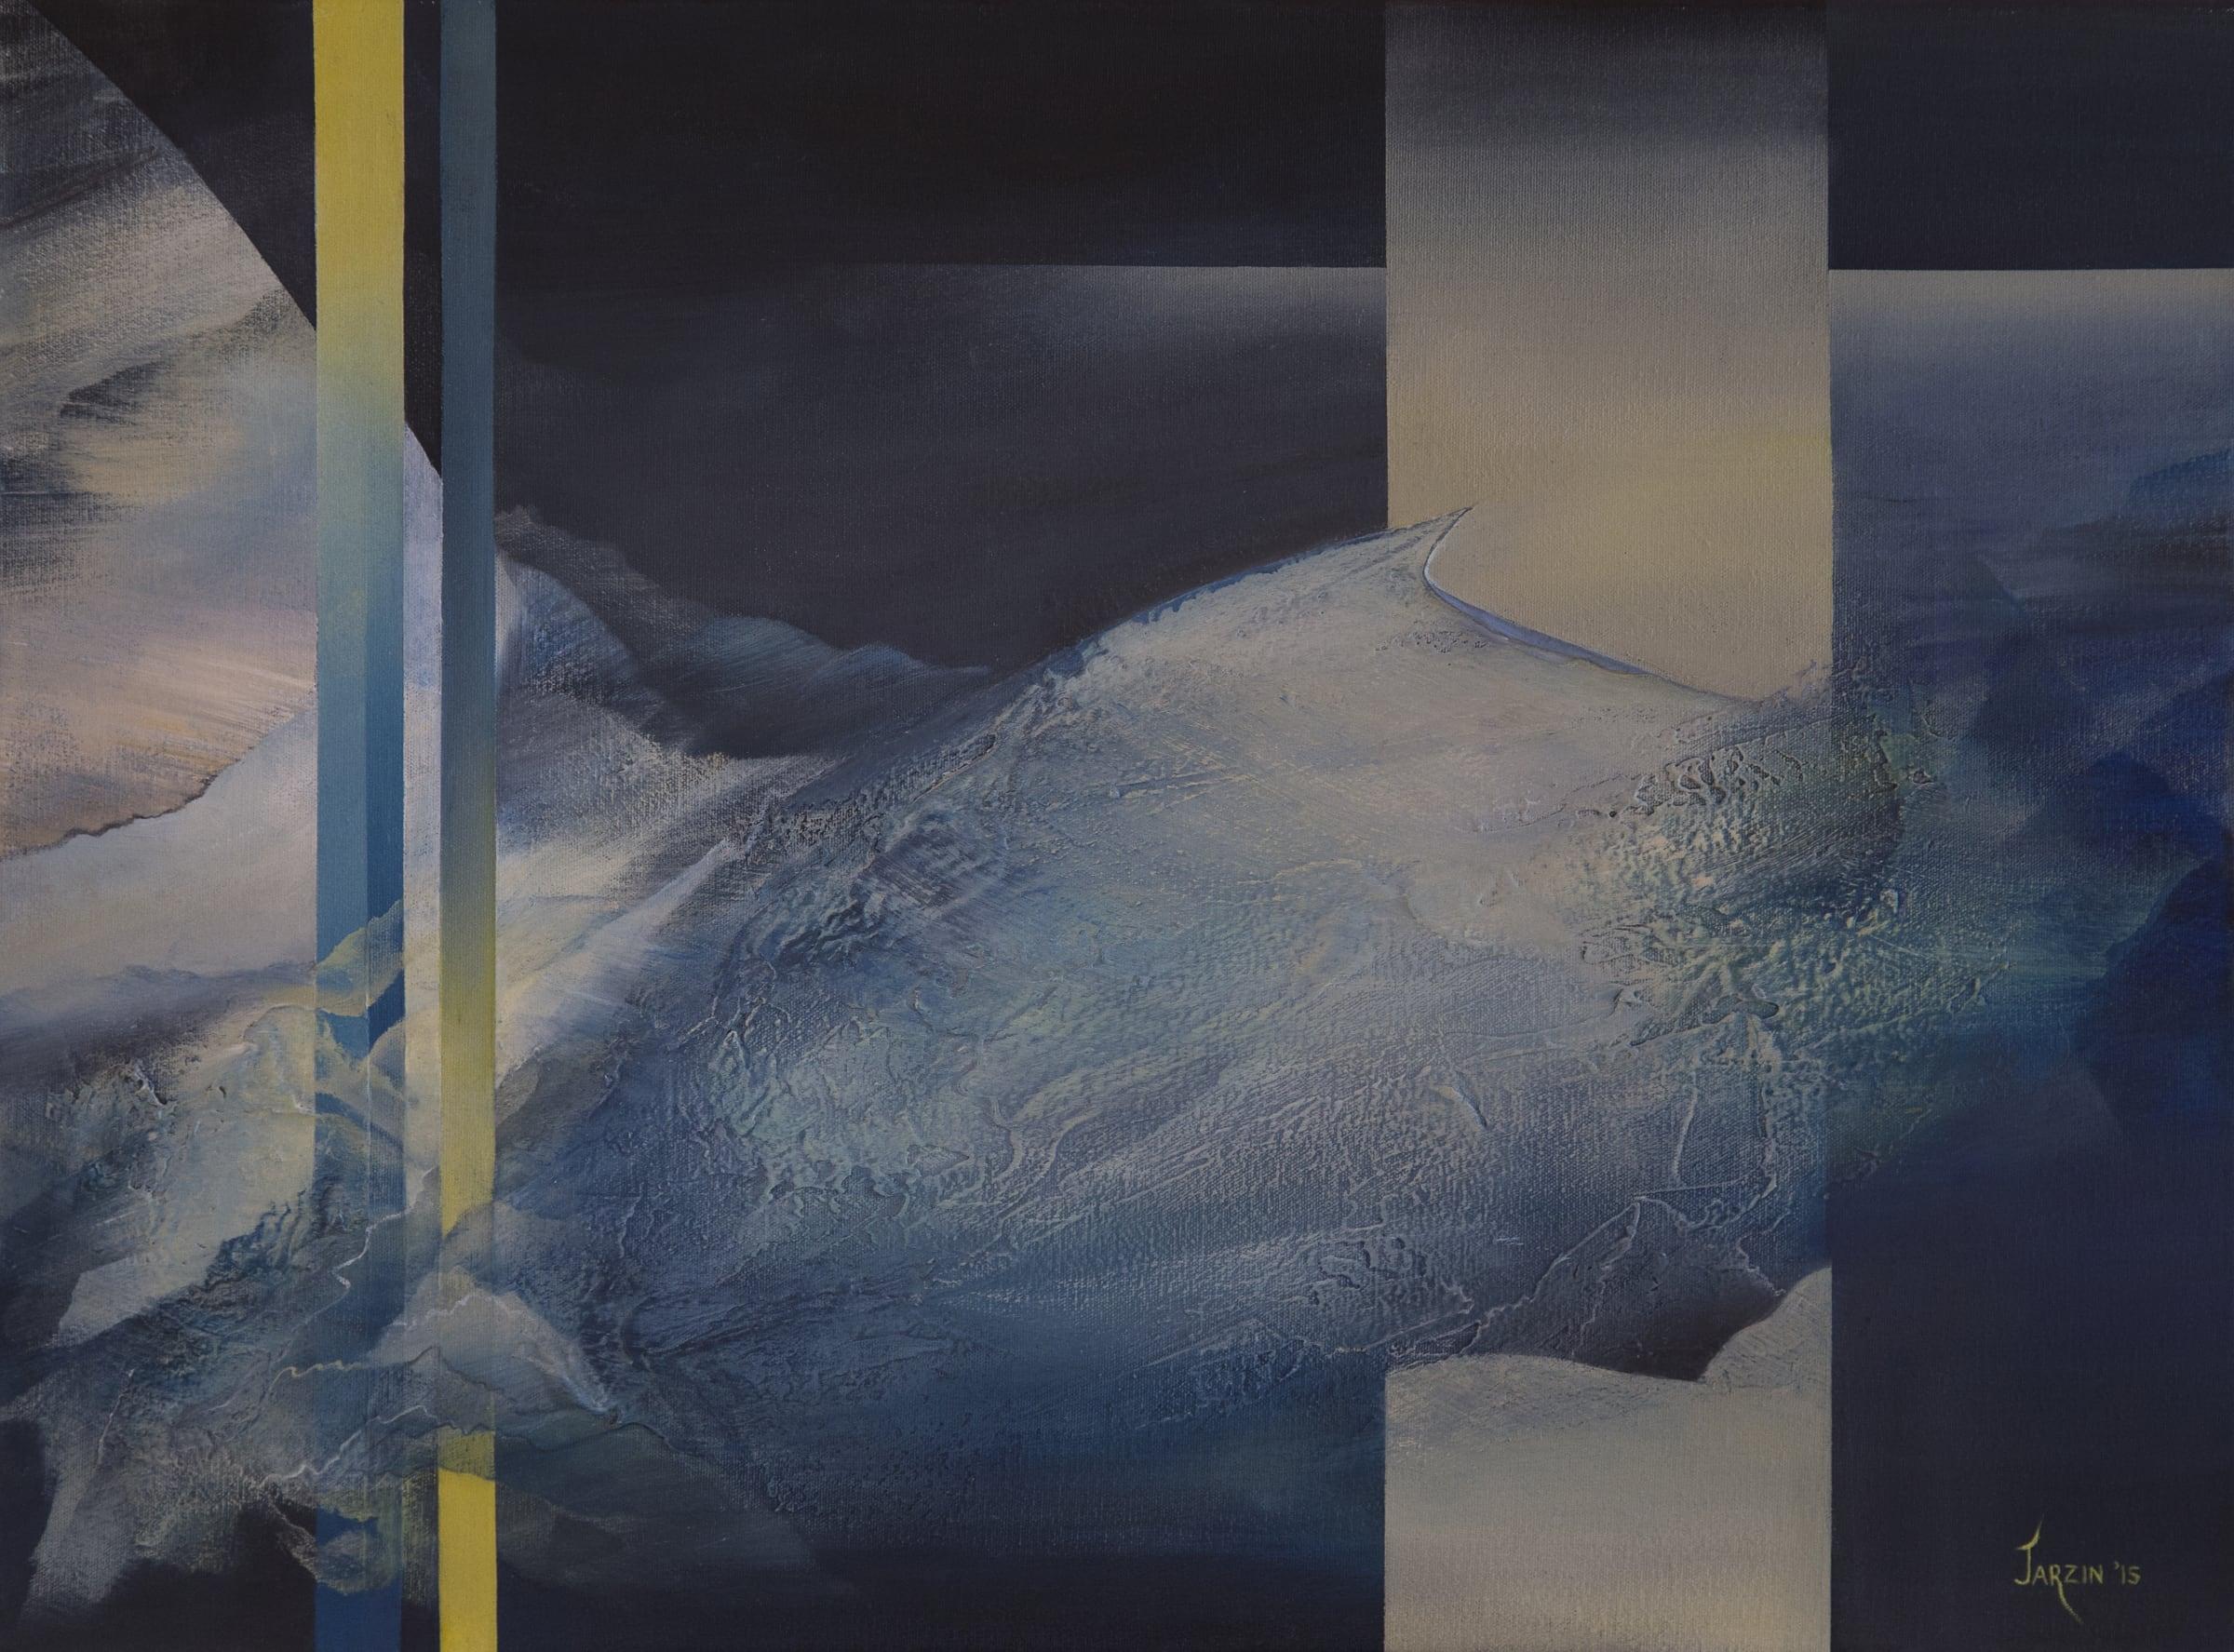 <span class=&#34;link fancybox-details-link&#34;><a href=&#34;/artists/44-sheila-jarzin/works/1010-sheila-jarzin-icescape-2015/&#34;>View Detail Page</a></span><div class=&#34;artist&#34;><strong>Sheila Jarzin</strong></div> <div class=&#34;title&#34;><em>Icescape</em>, 2015</div> <div class=&#34;medium&#34;>Oil on Canvas</div> <div class=&#34;dimensions&#34;>56cm x 76cm</div><div class=&#34;price&#34;>R6,800.00</div>